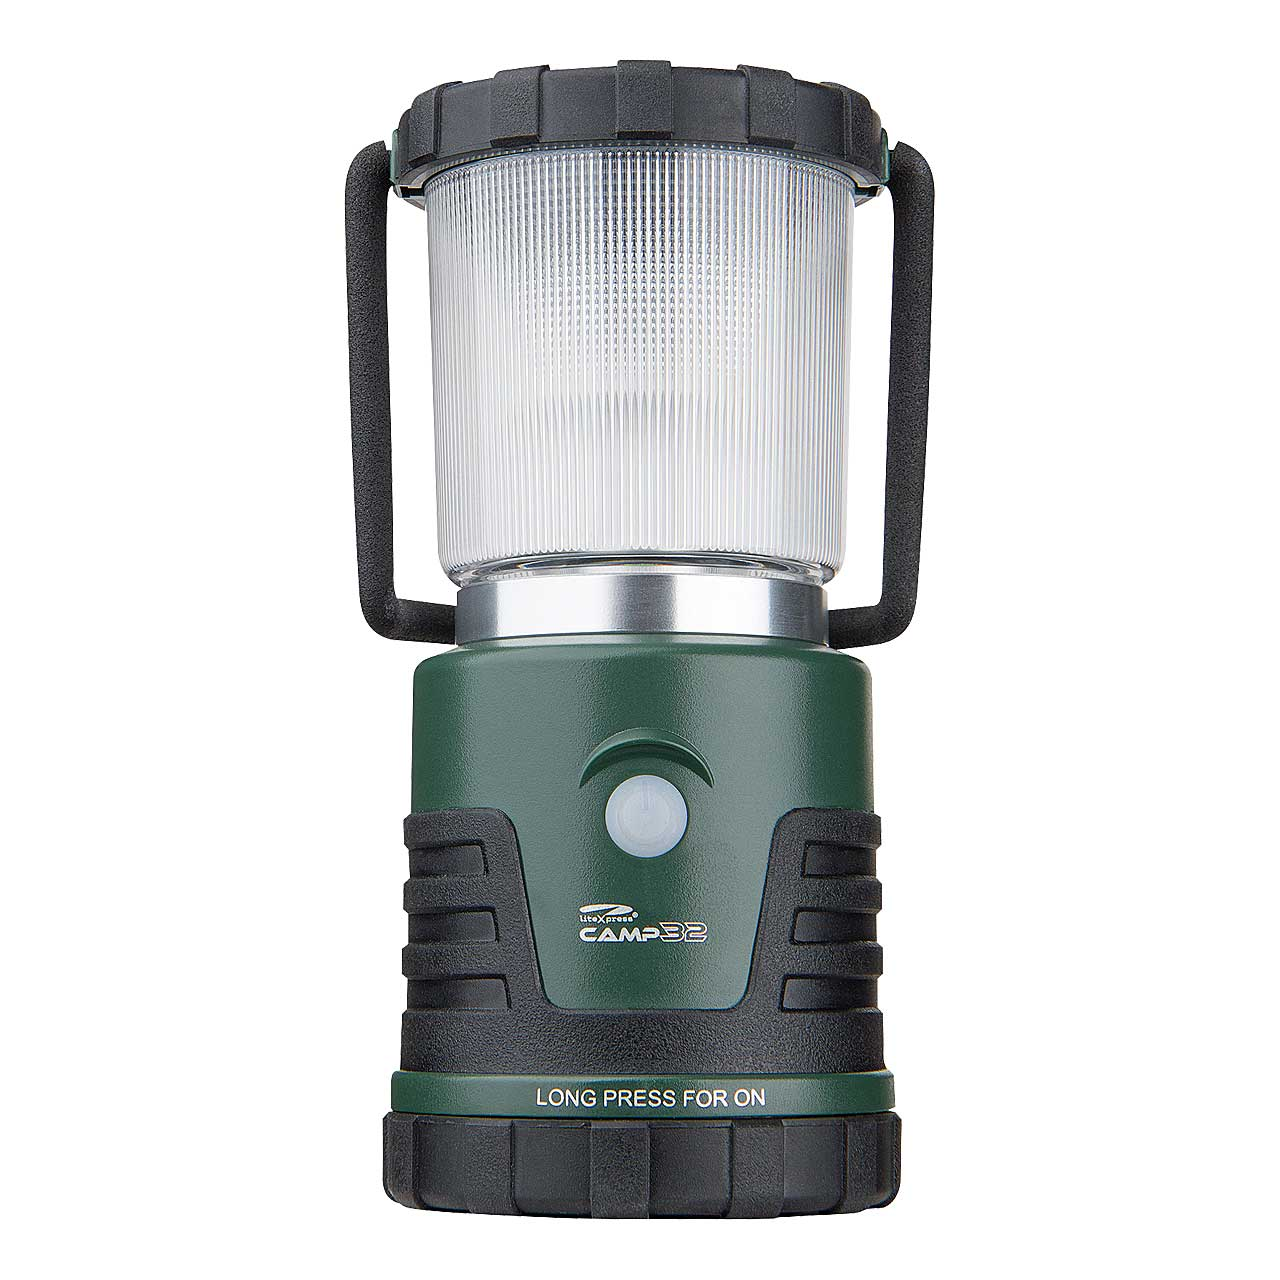 CAMP 32 LED Laterne